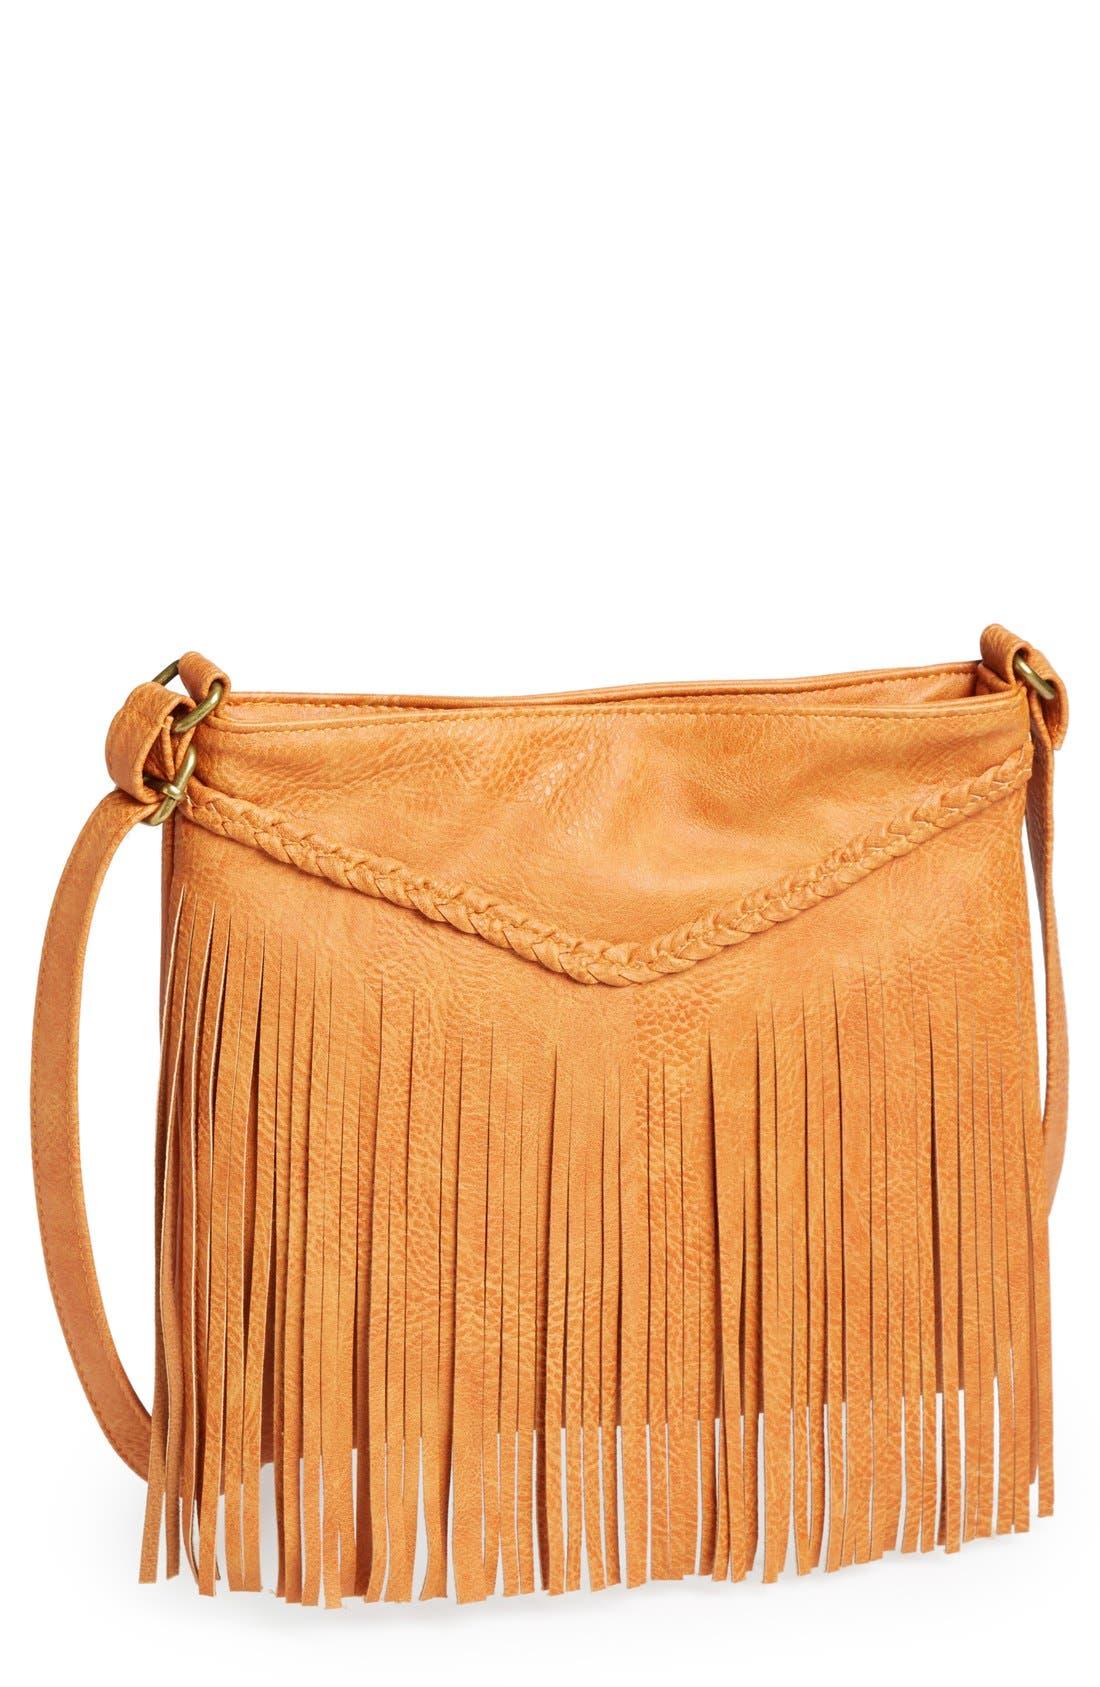 Alternate Image 1 Selected - BP. Fringe Crossbody Bag